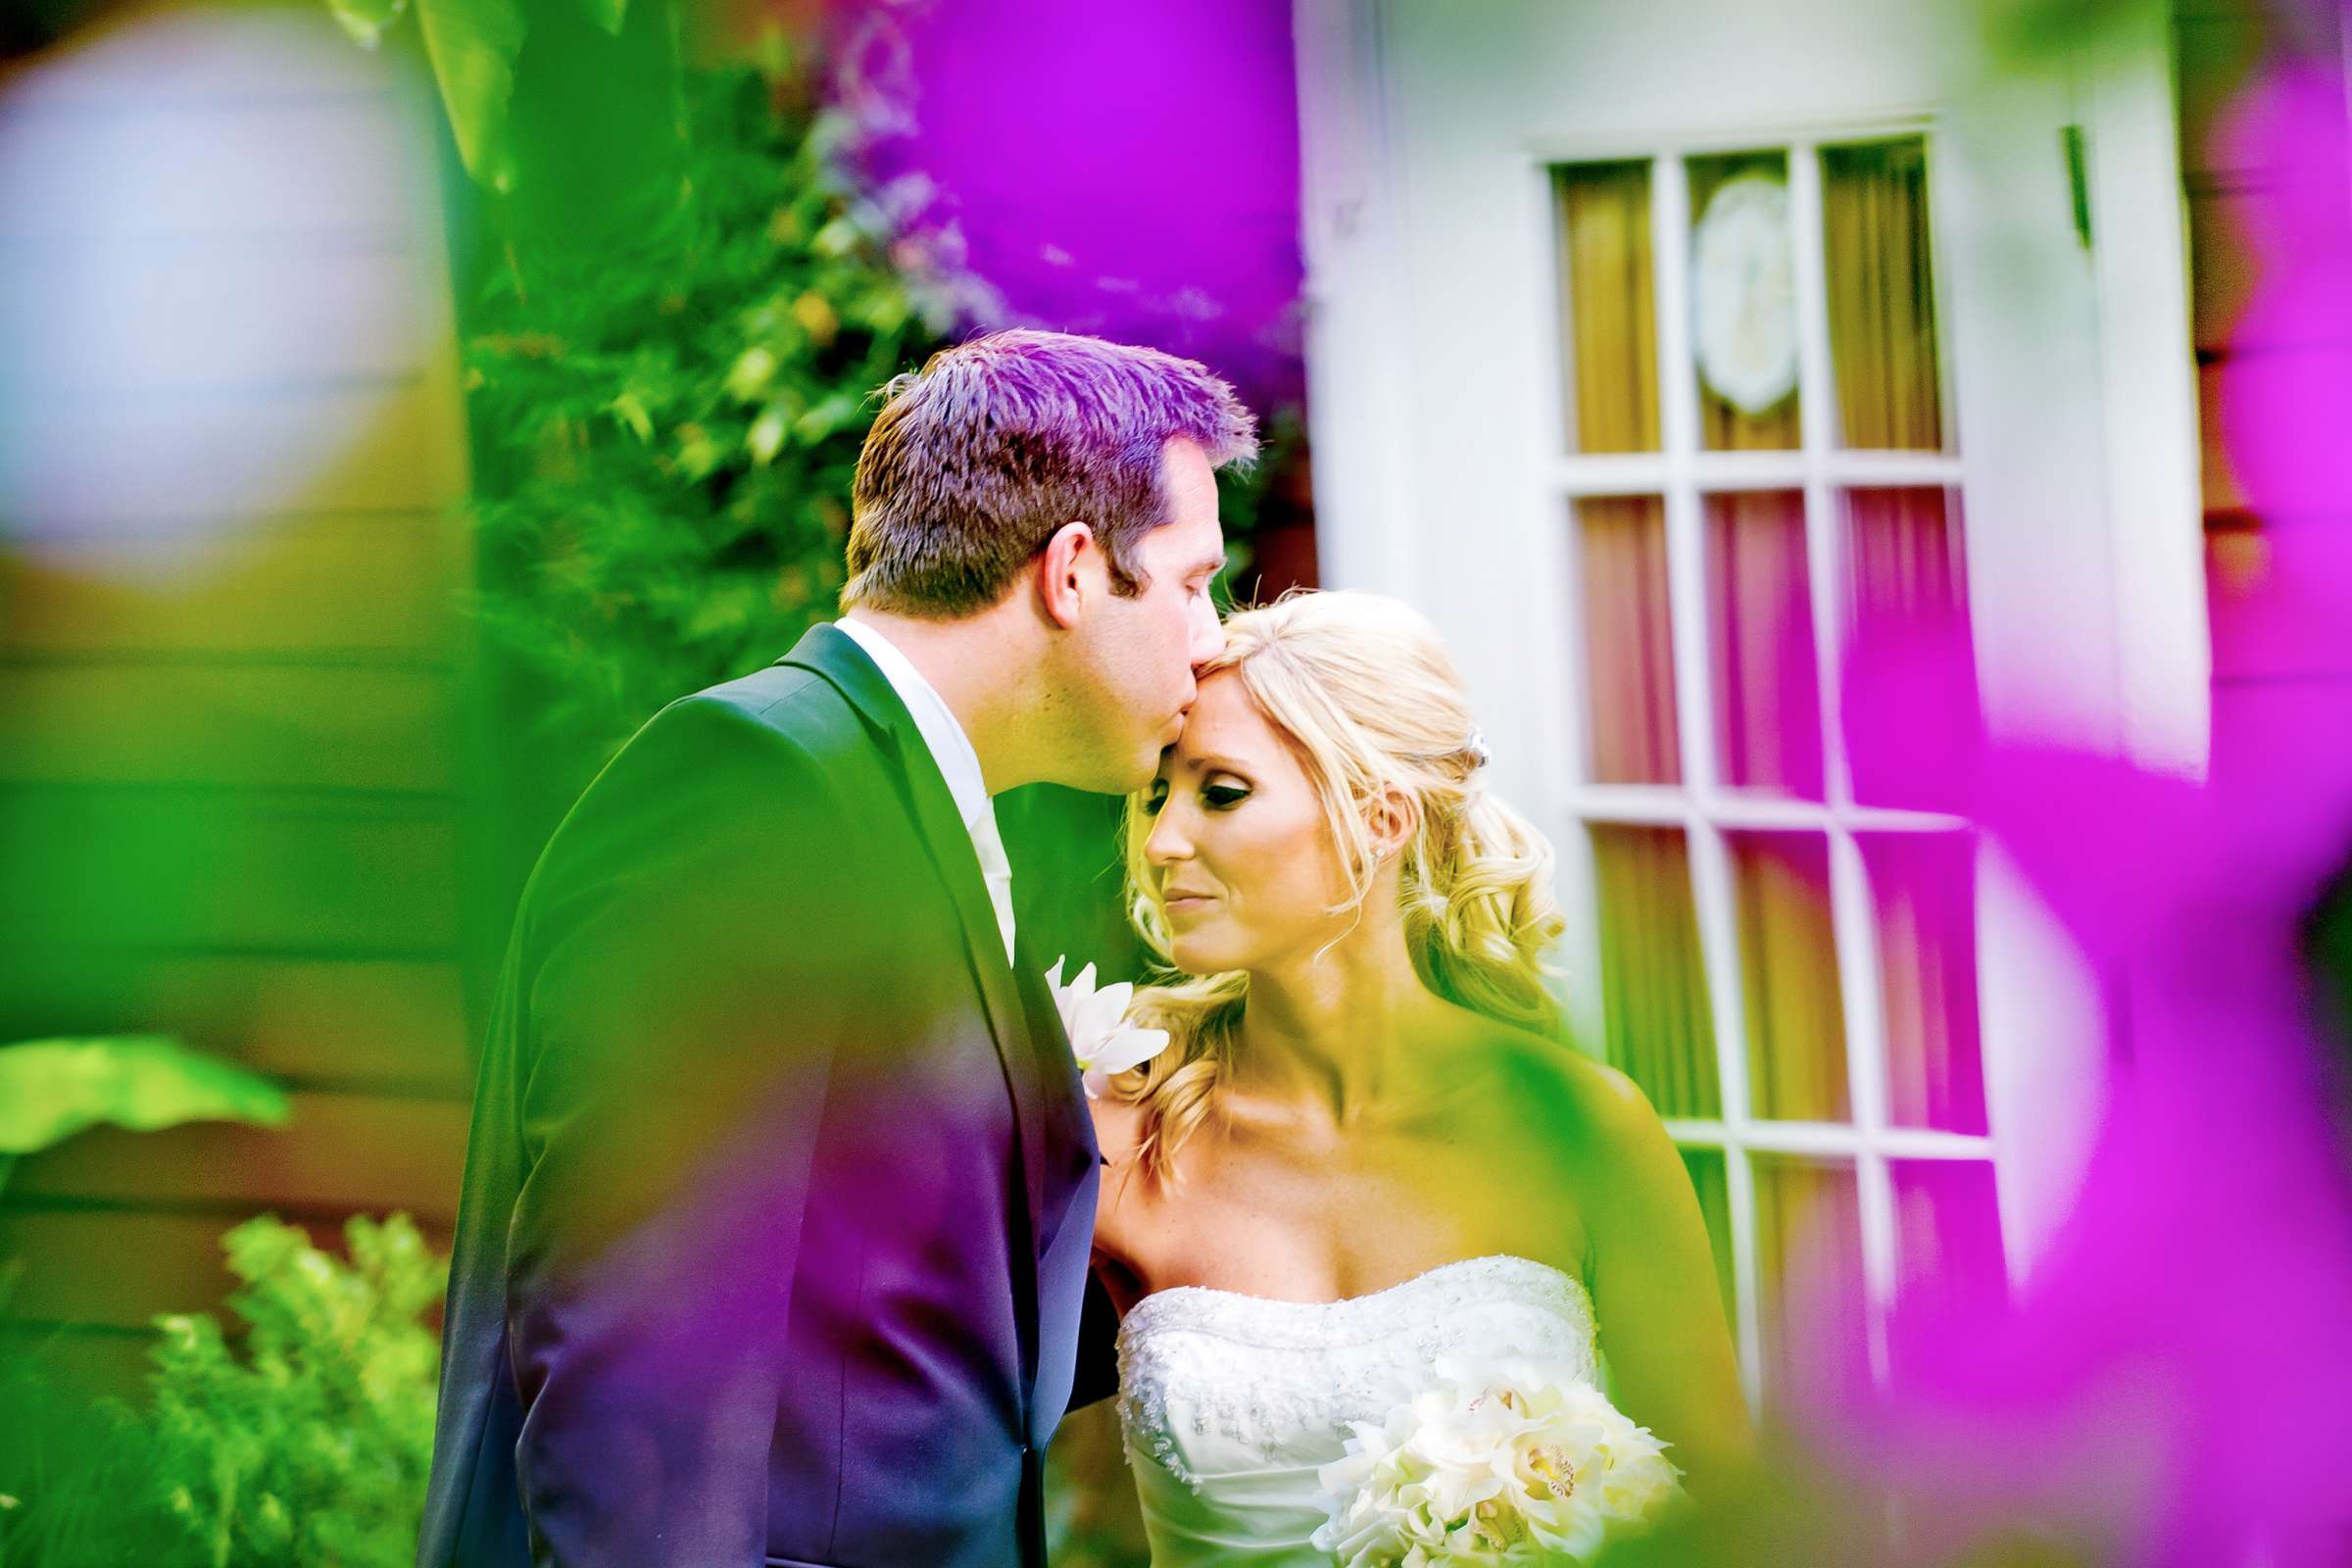 40a010463e0e7 Breanna and Ryan | San Diego Photographer - True Photography